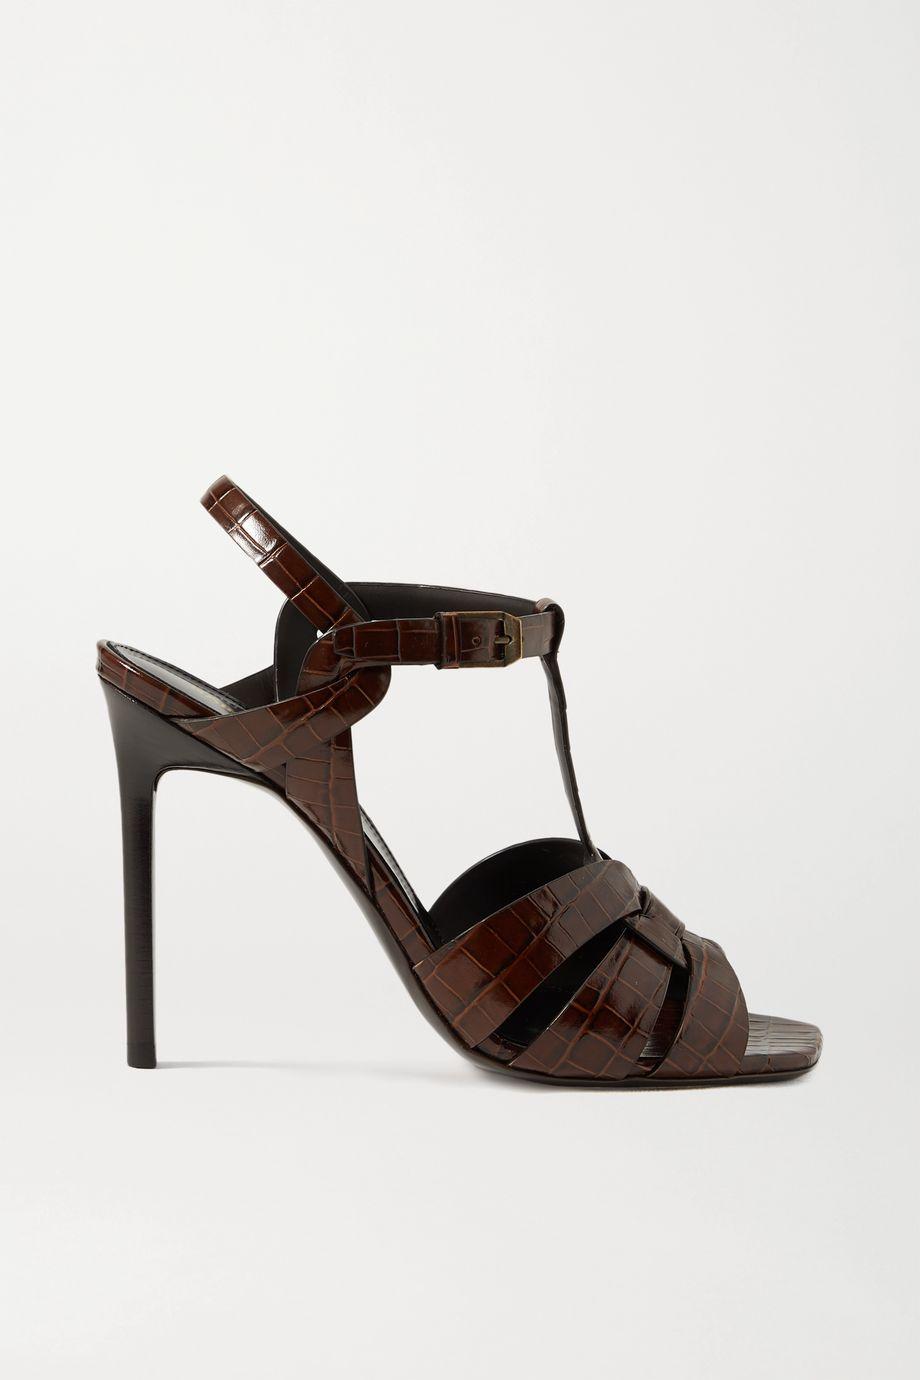 SAINT LAURENT Tribute Sandalen aus Leder mit Krokodileffekt in Flechtoptik